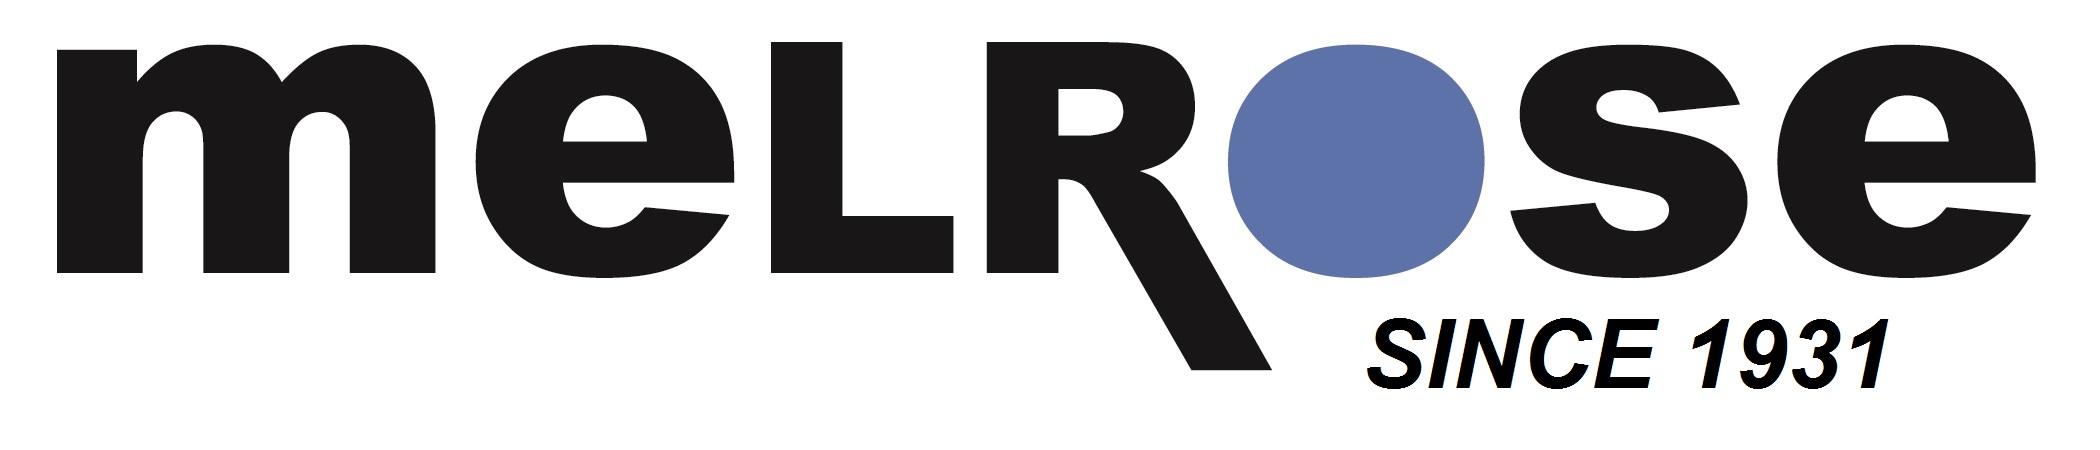 melrose-logo-w-year.jpg